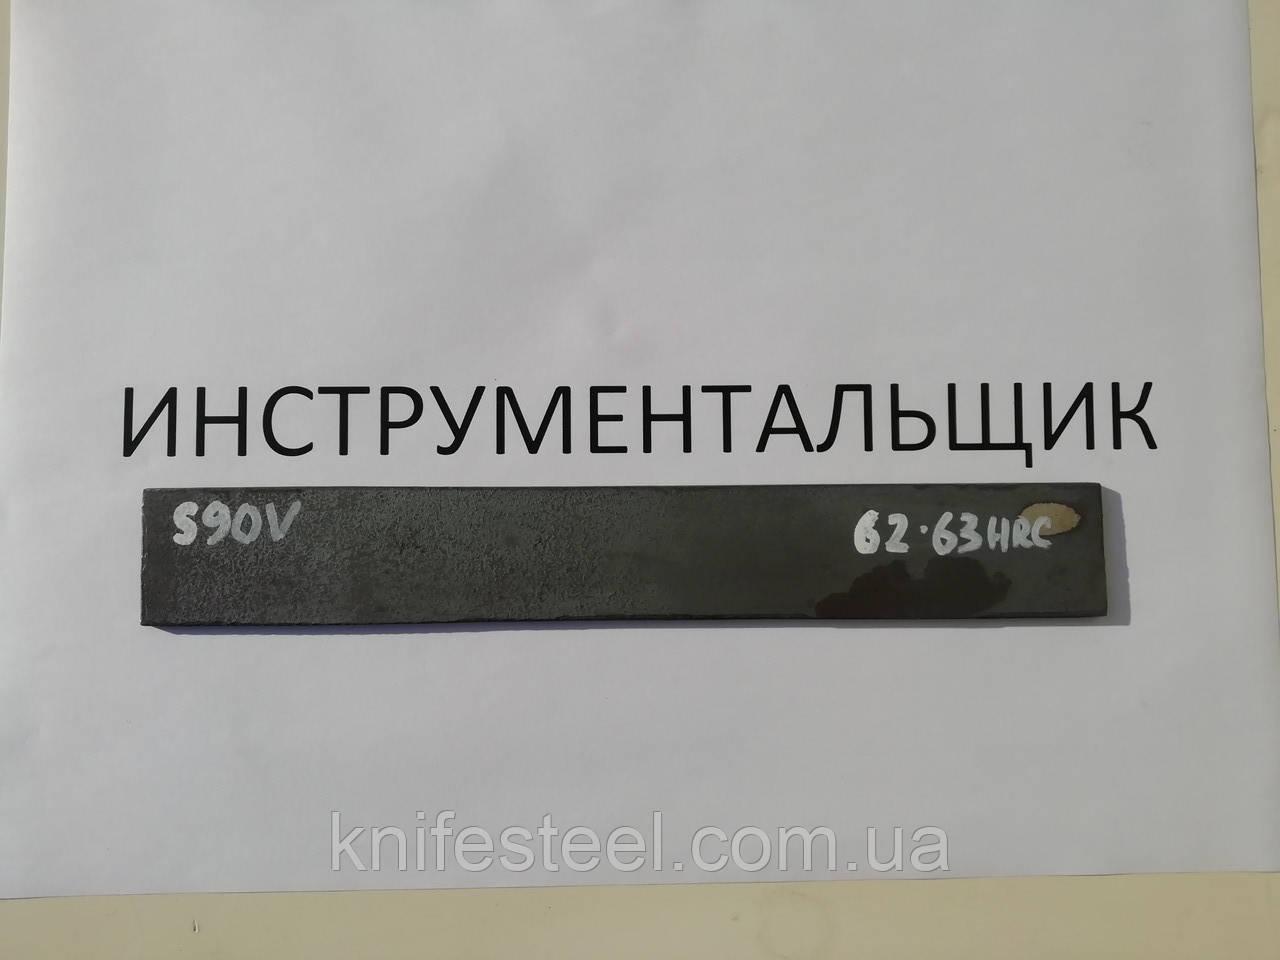 Заготовка для ножа сталь CPM S90V 200х30х4.6 мм термообработка (62-63 HRC)